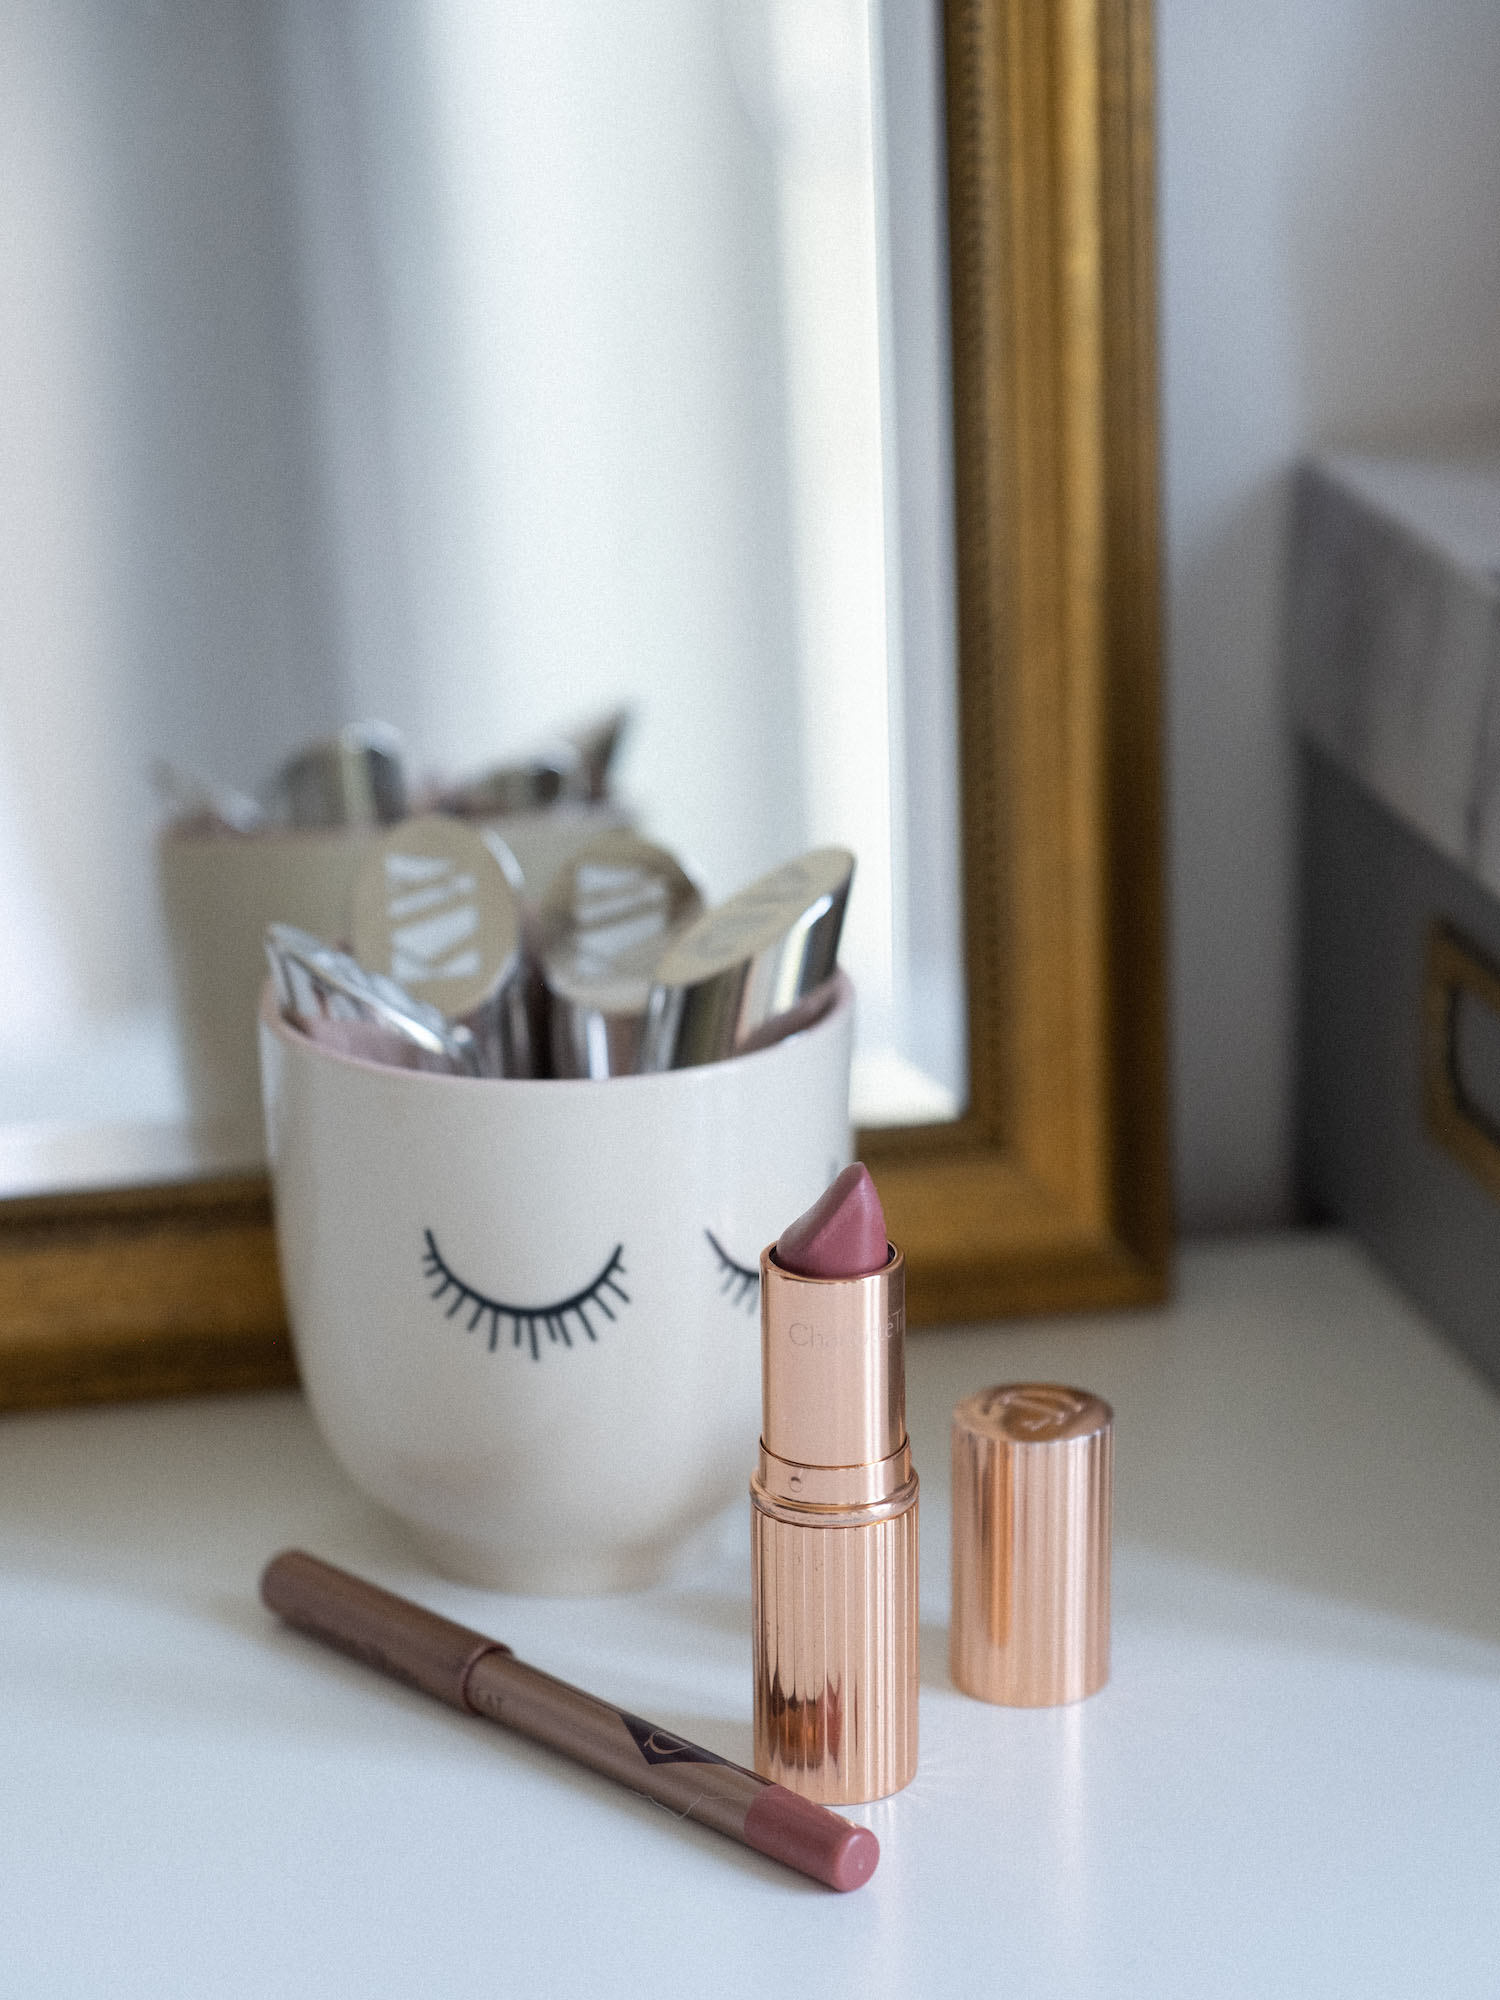 Beautyblog Bare Minds Chartollte Tilbury